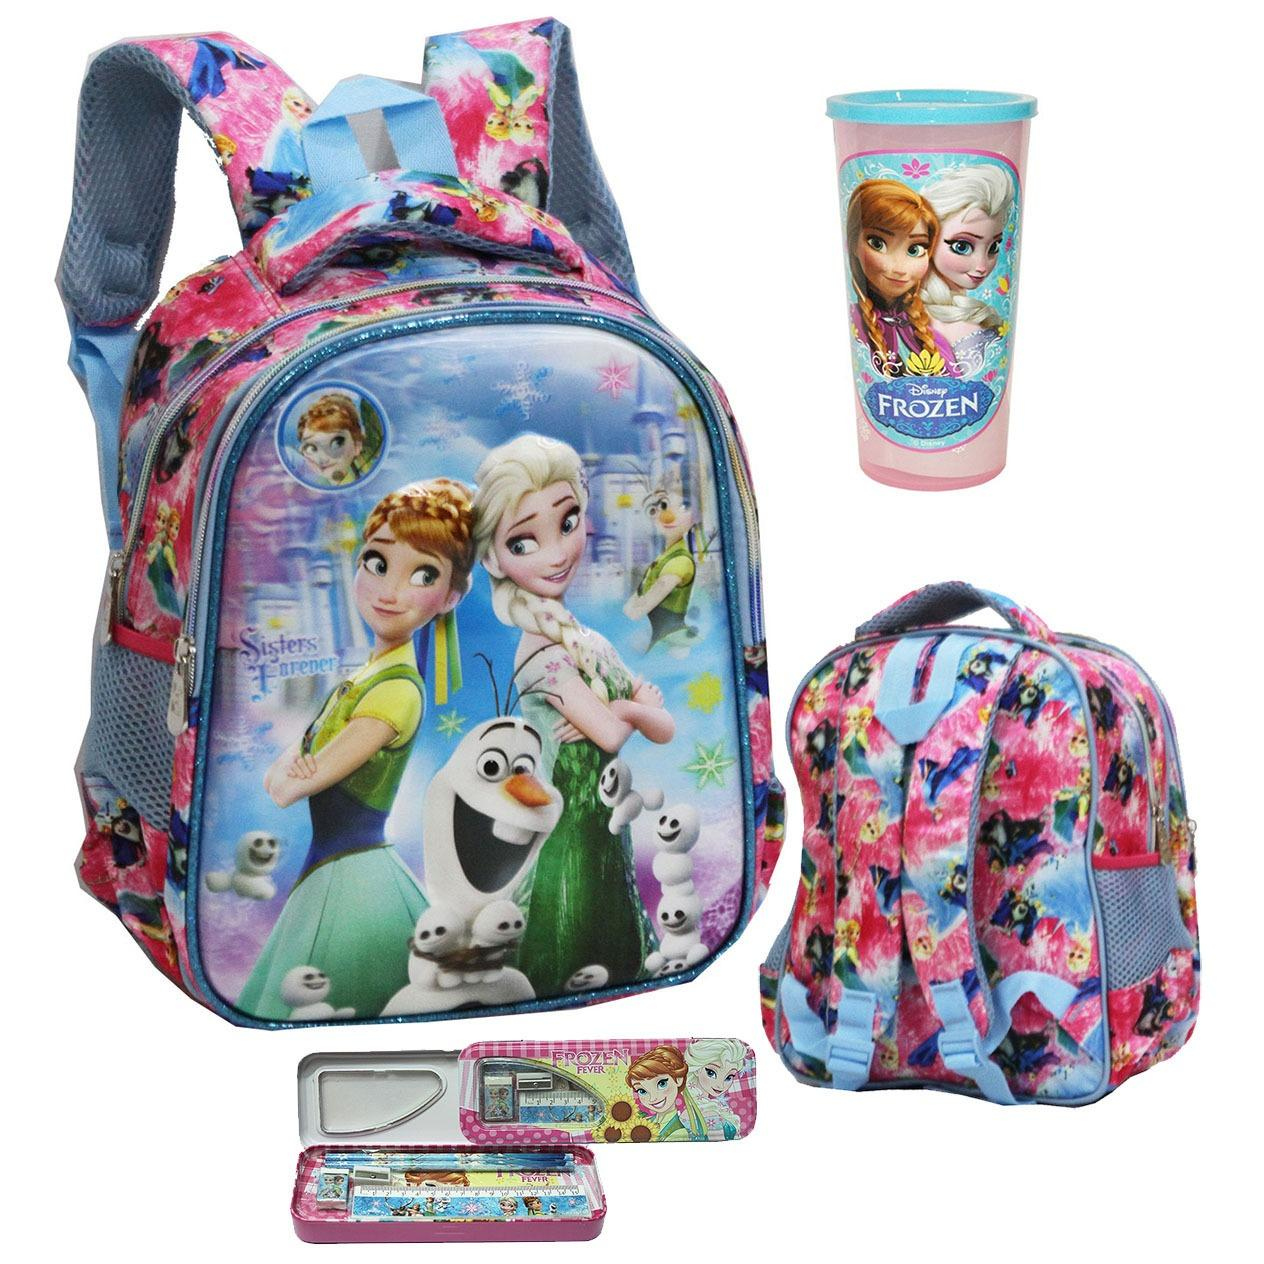 Beli Onlan Disney Frozen Fever 5D Timbul Hologram Tas Ransel Tk Kualitas Bagus Kotak Pensil Gelas Minum Anak Pink Seken